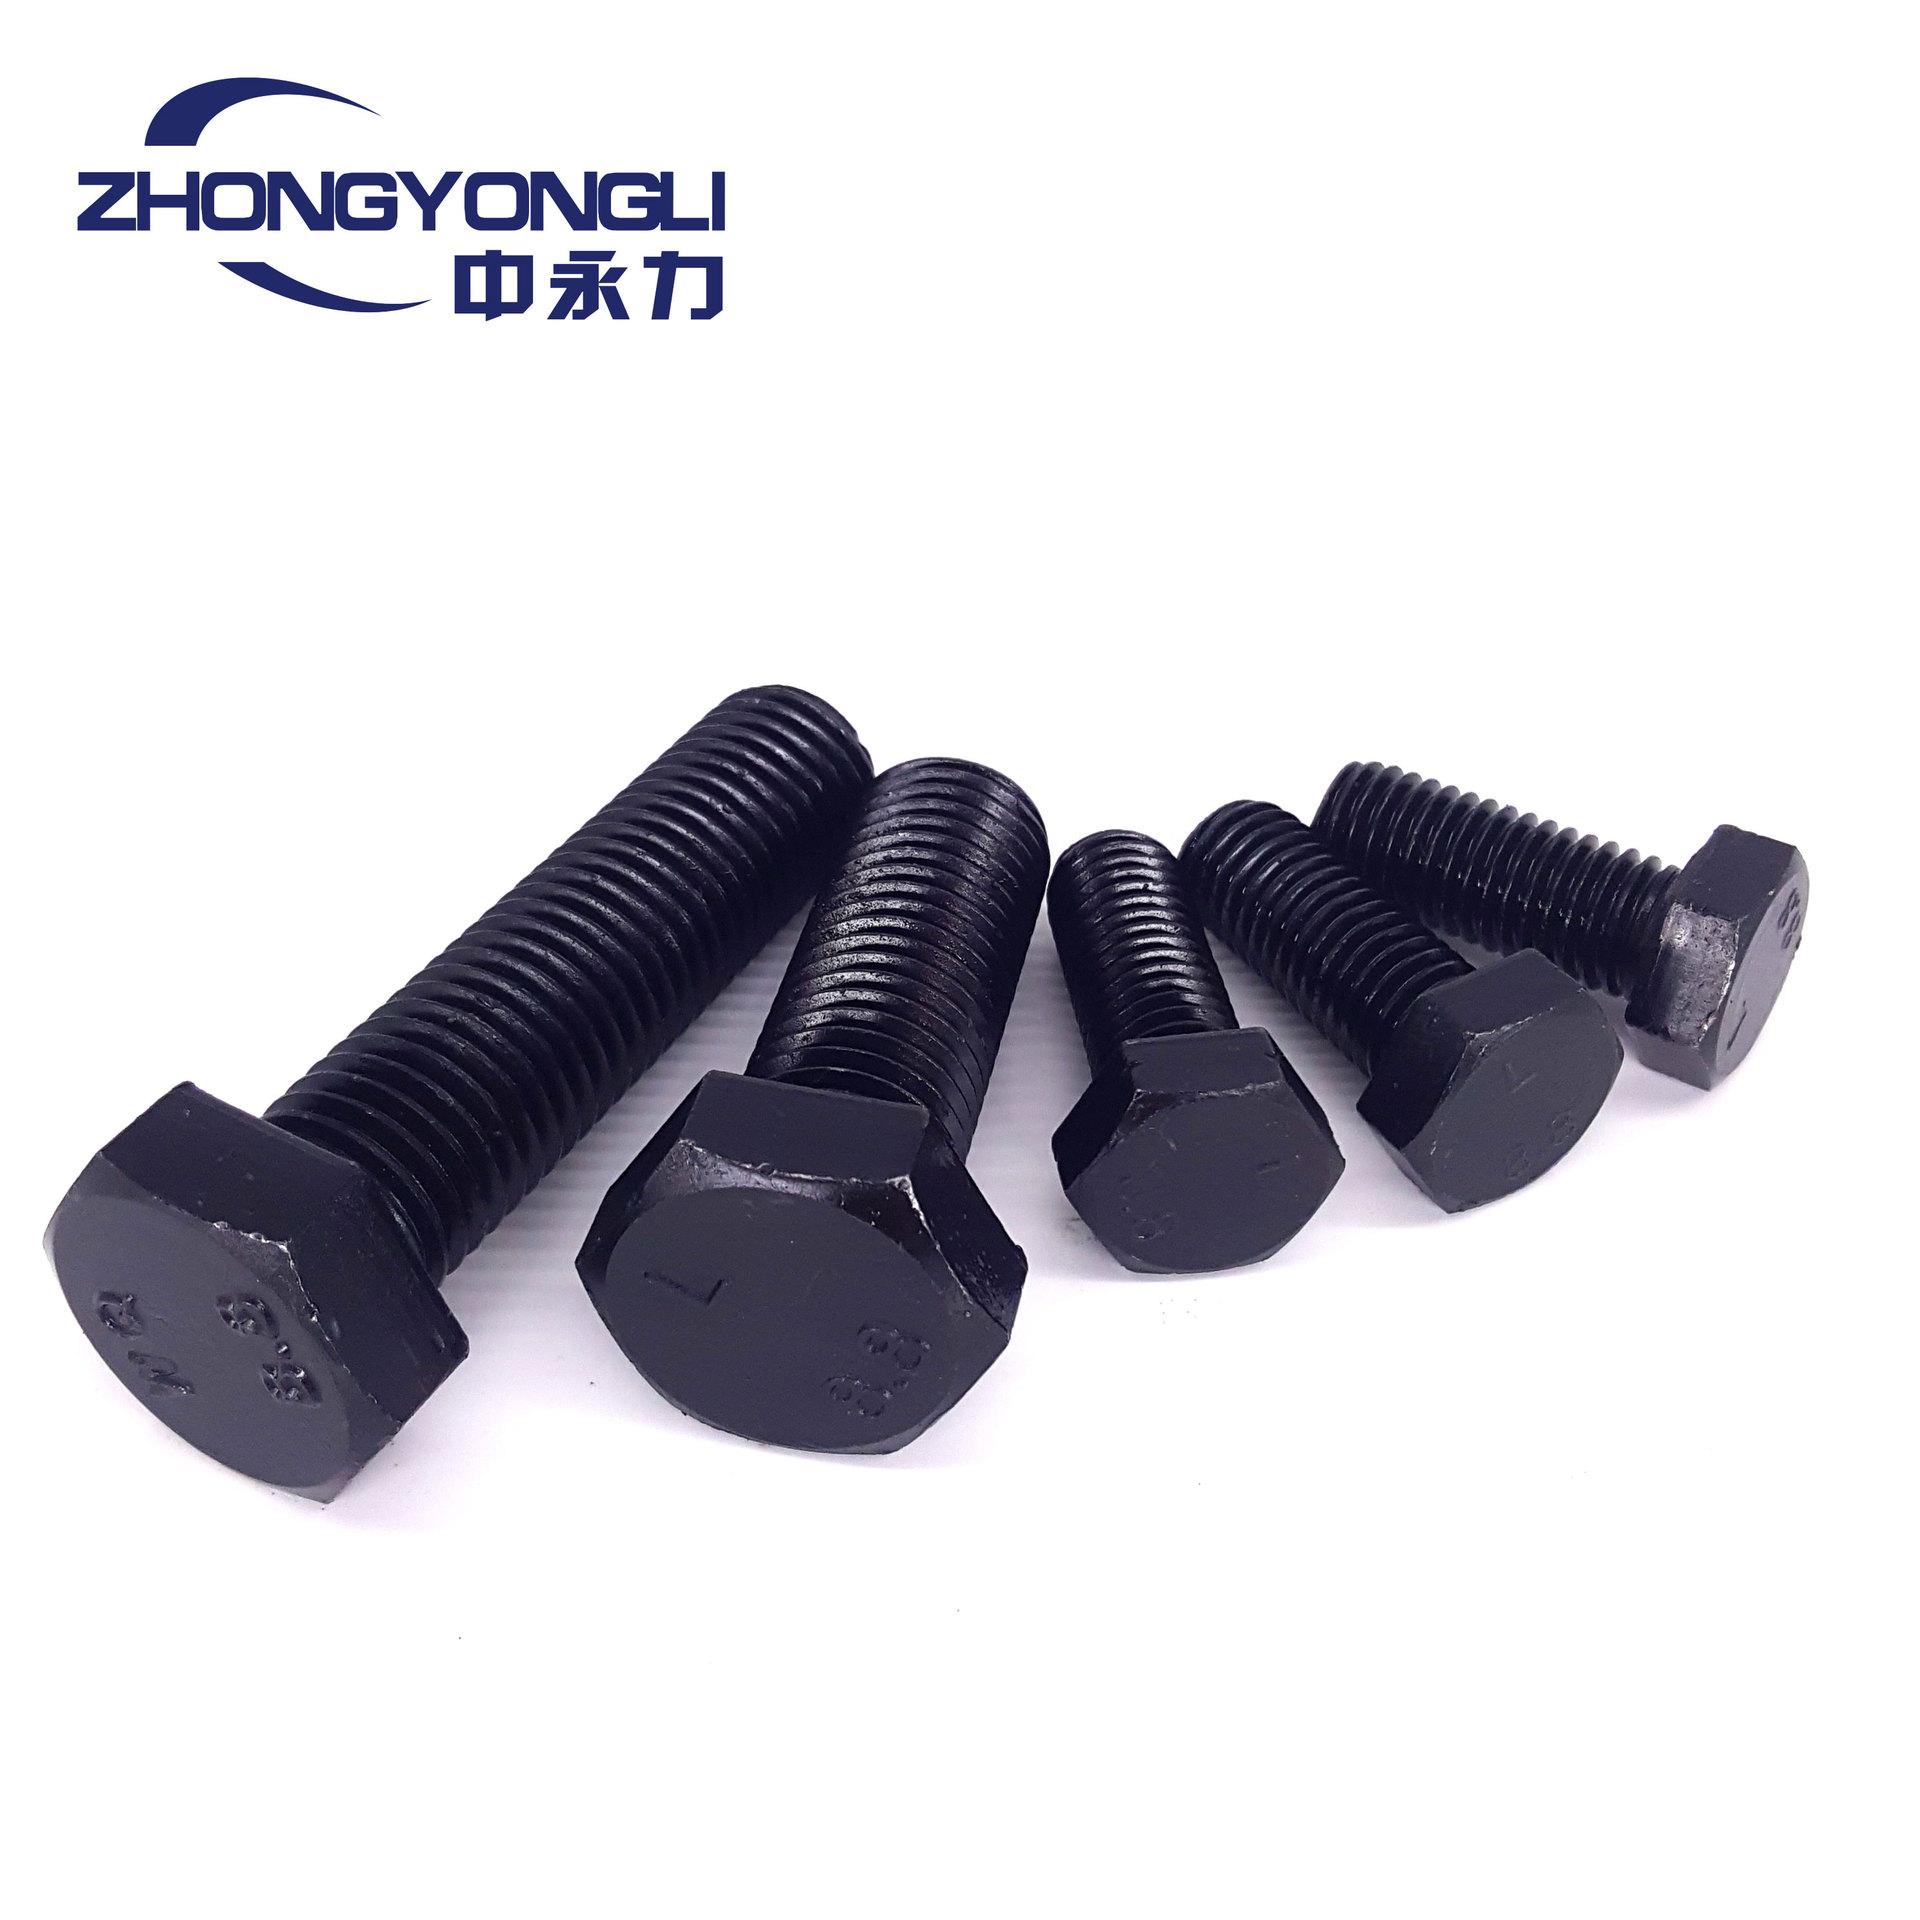 QIZHENG High-strength bolts and nuts 4.8 grades 8.8 grades 10.9 grades 12.9 grades Hexagon bolts Hex